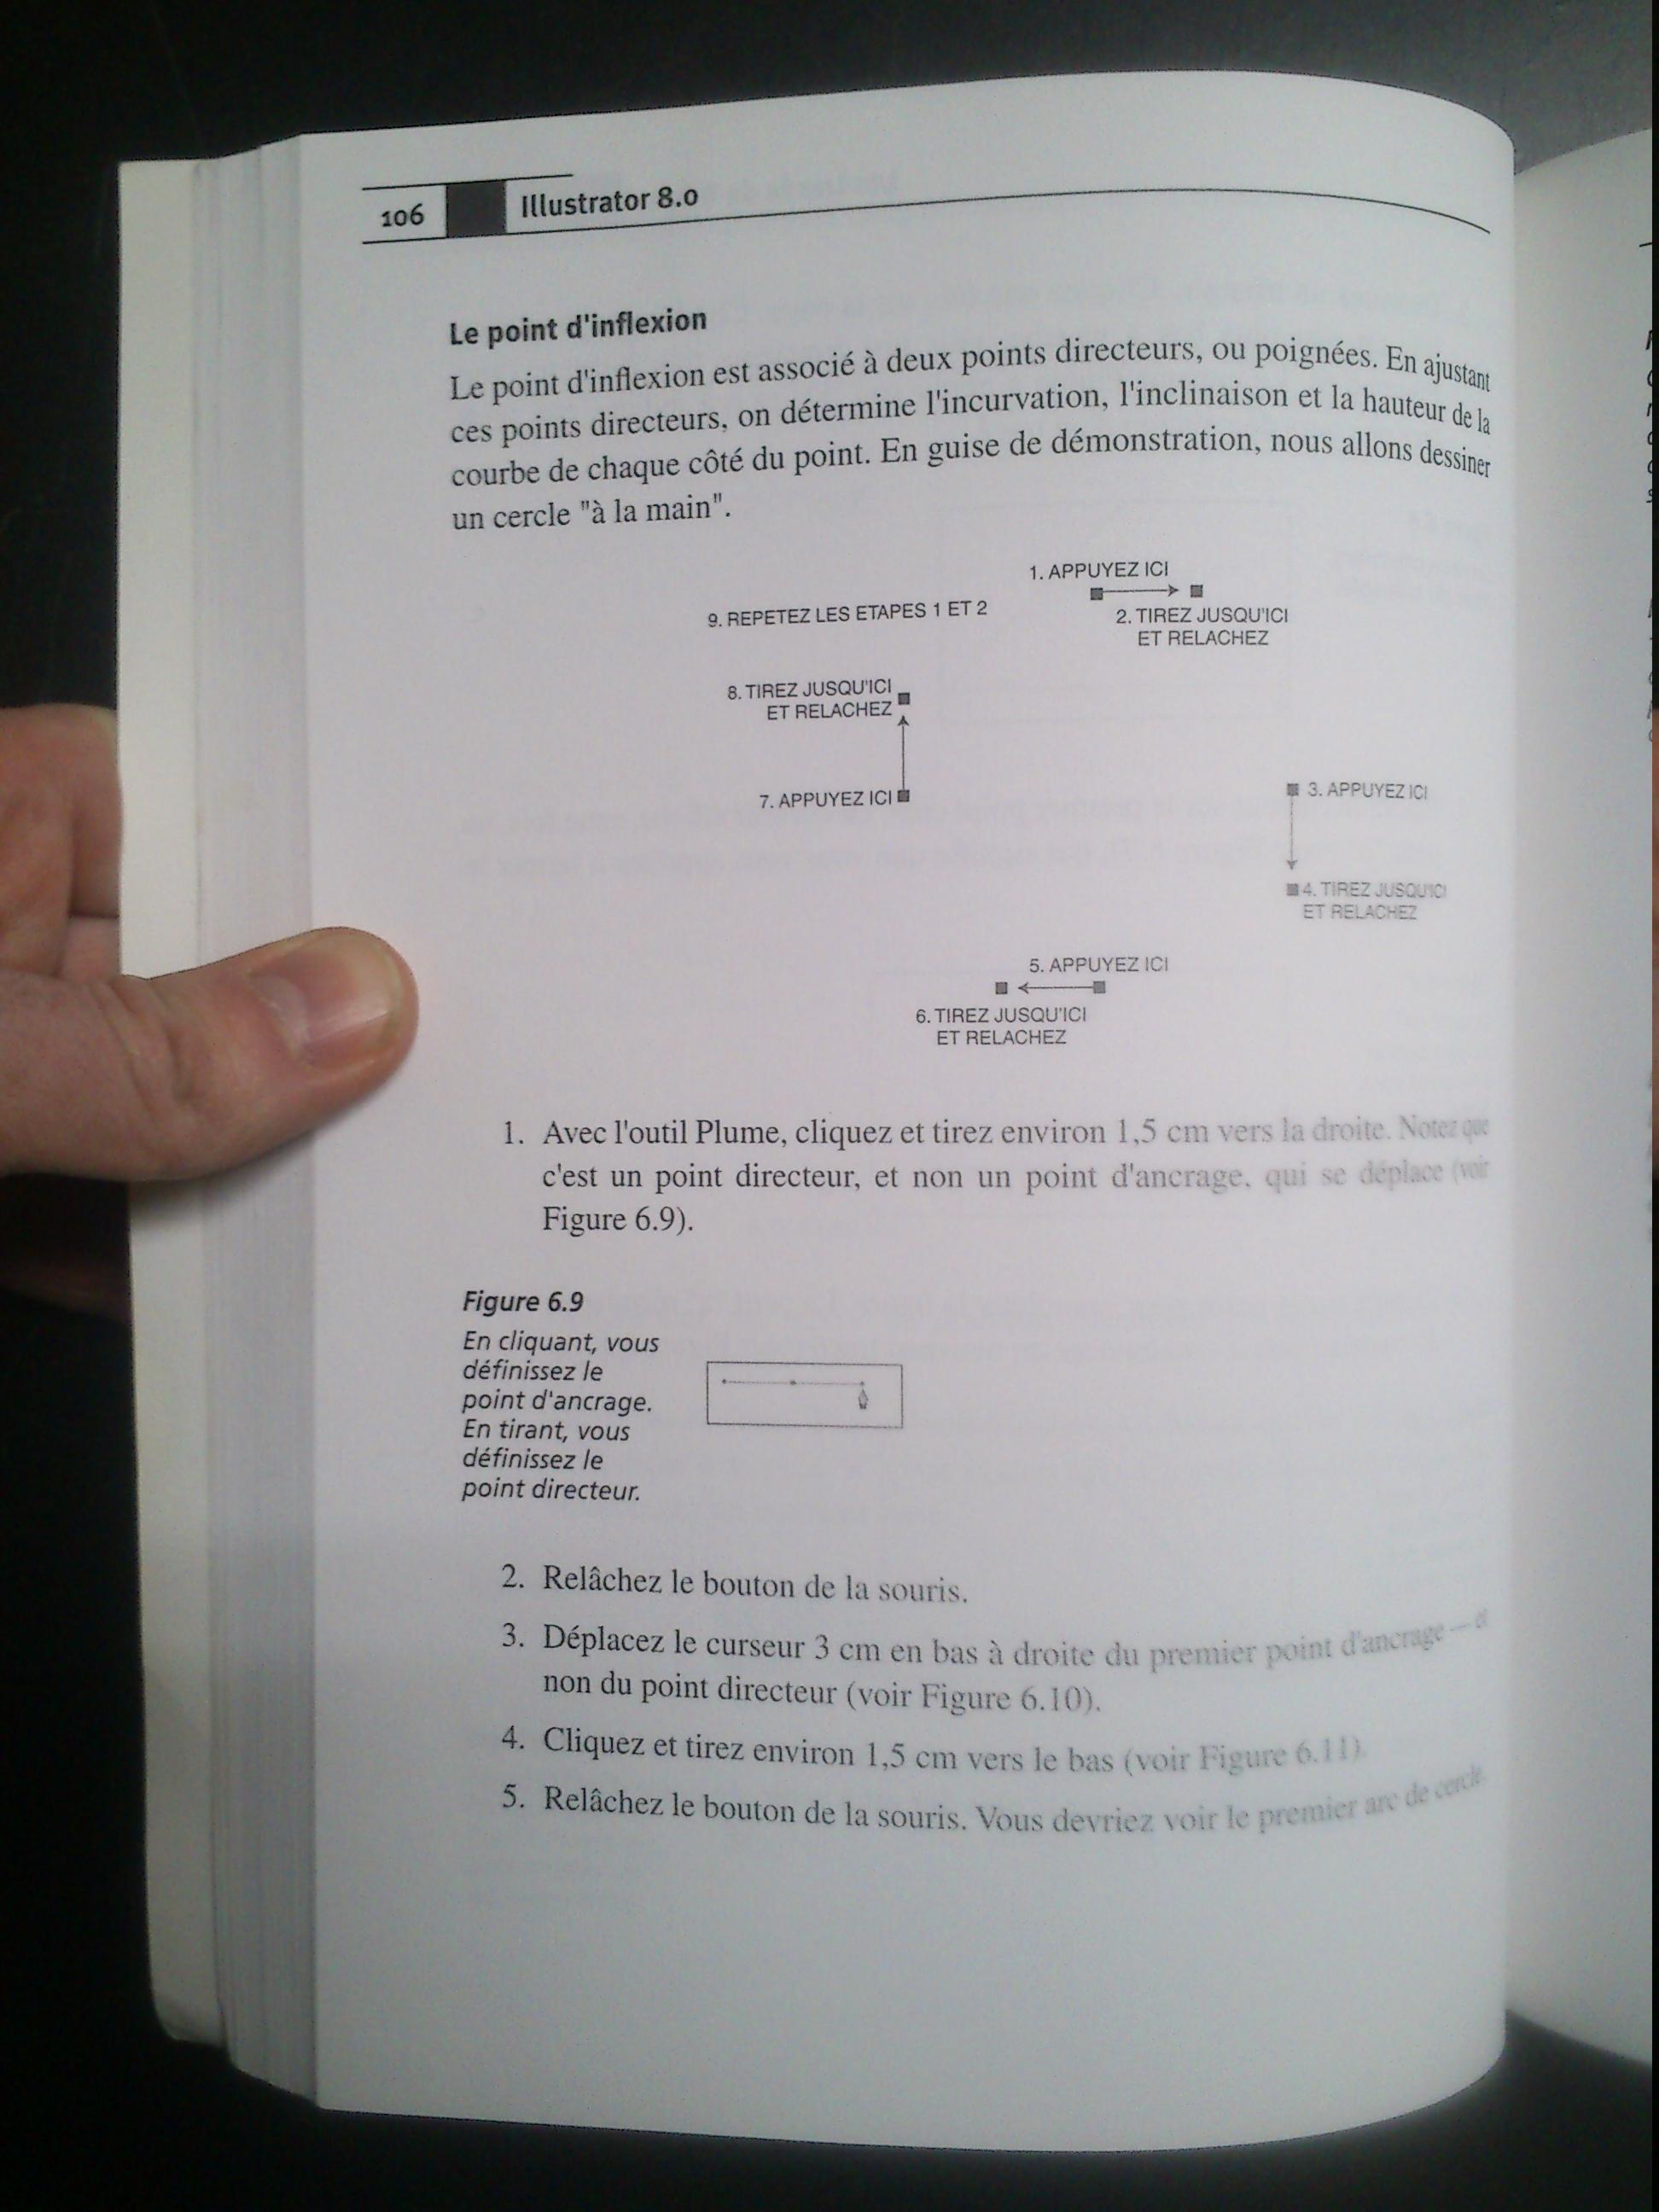 other/photos bibliothèque cambre/DSC_0438.jpg